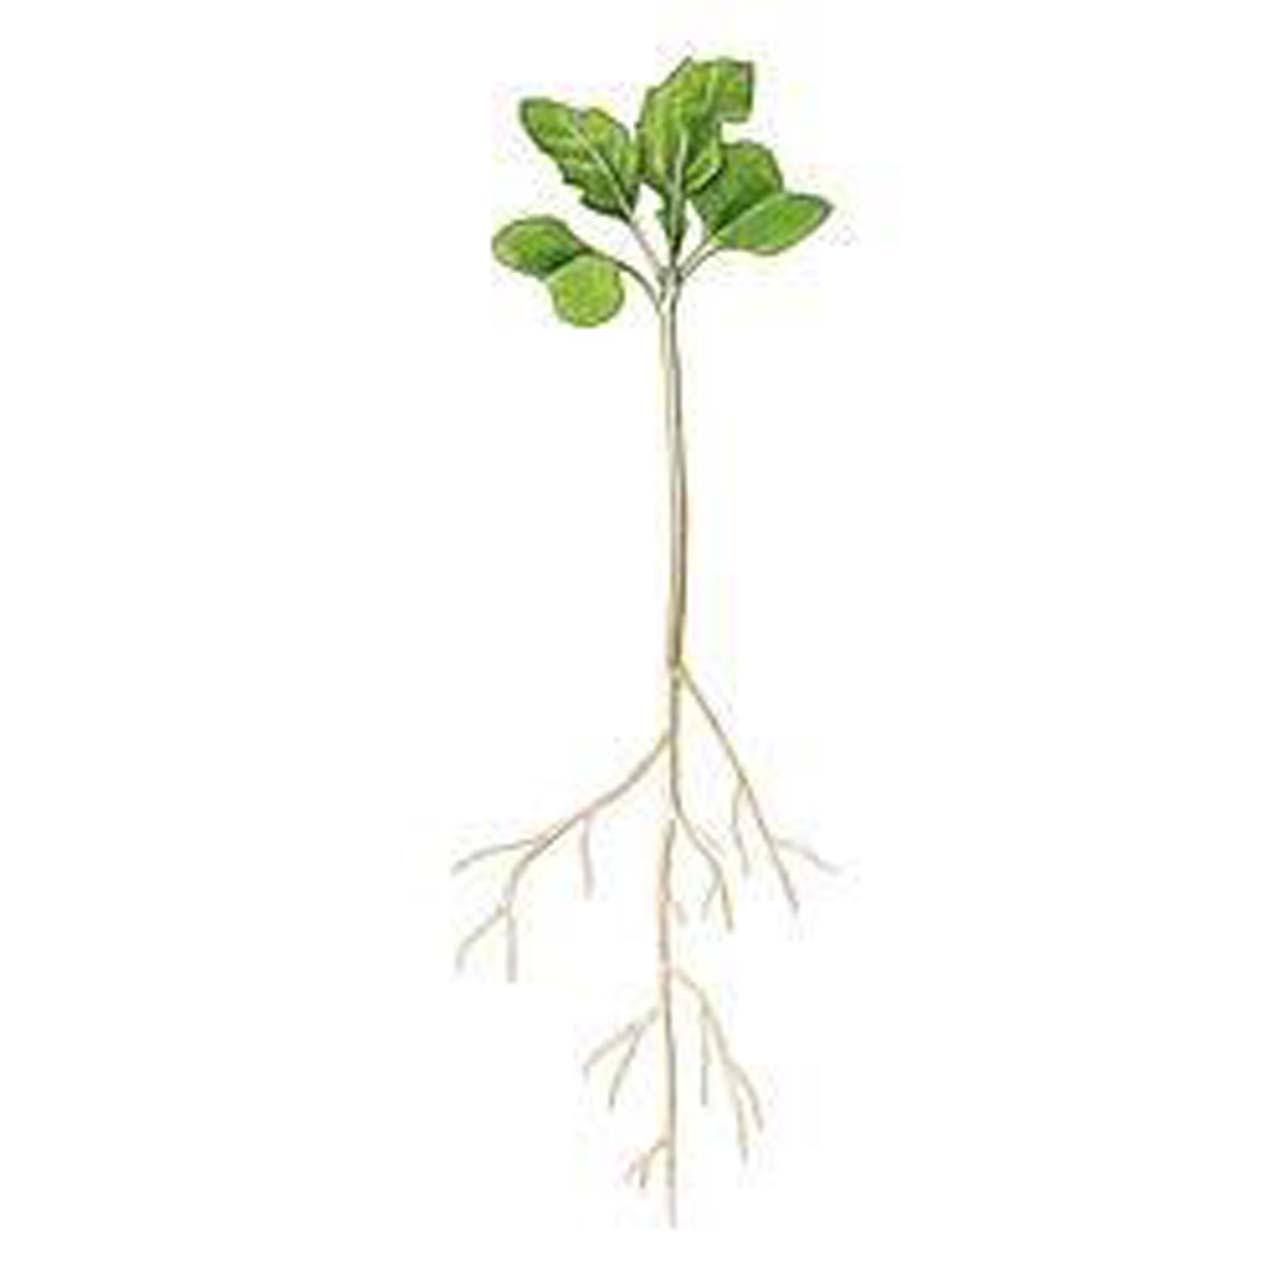 S13.1 - Brassica rapa seeds, standard